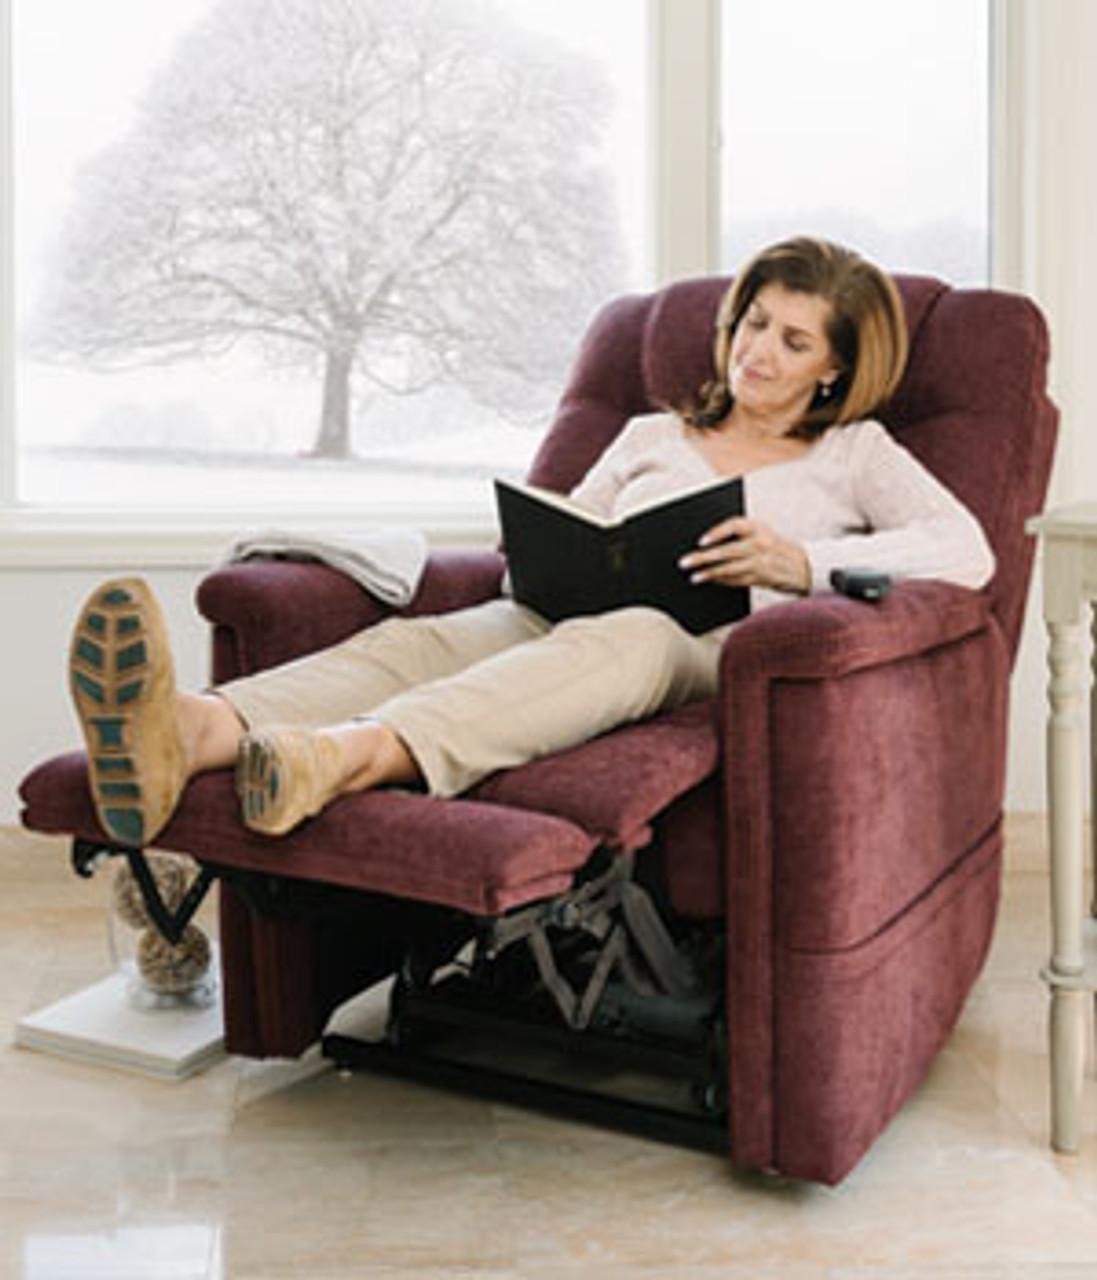 VivaLift! Legacy Lift Chair PLR958 in Use